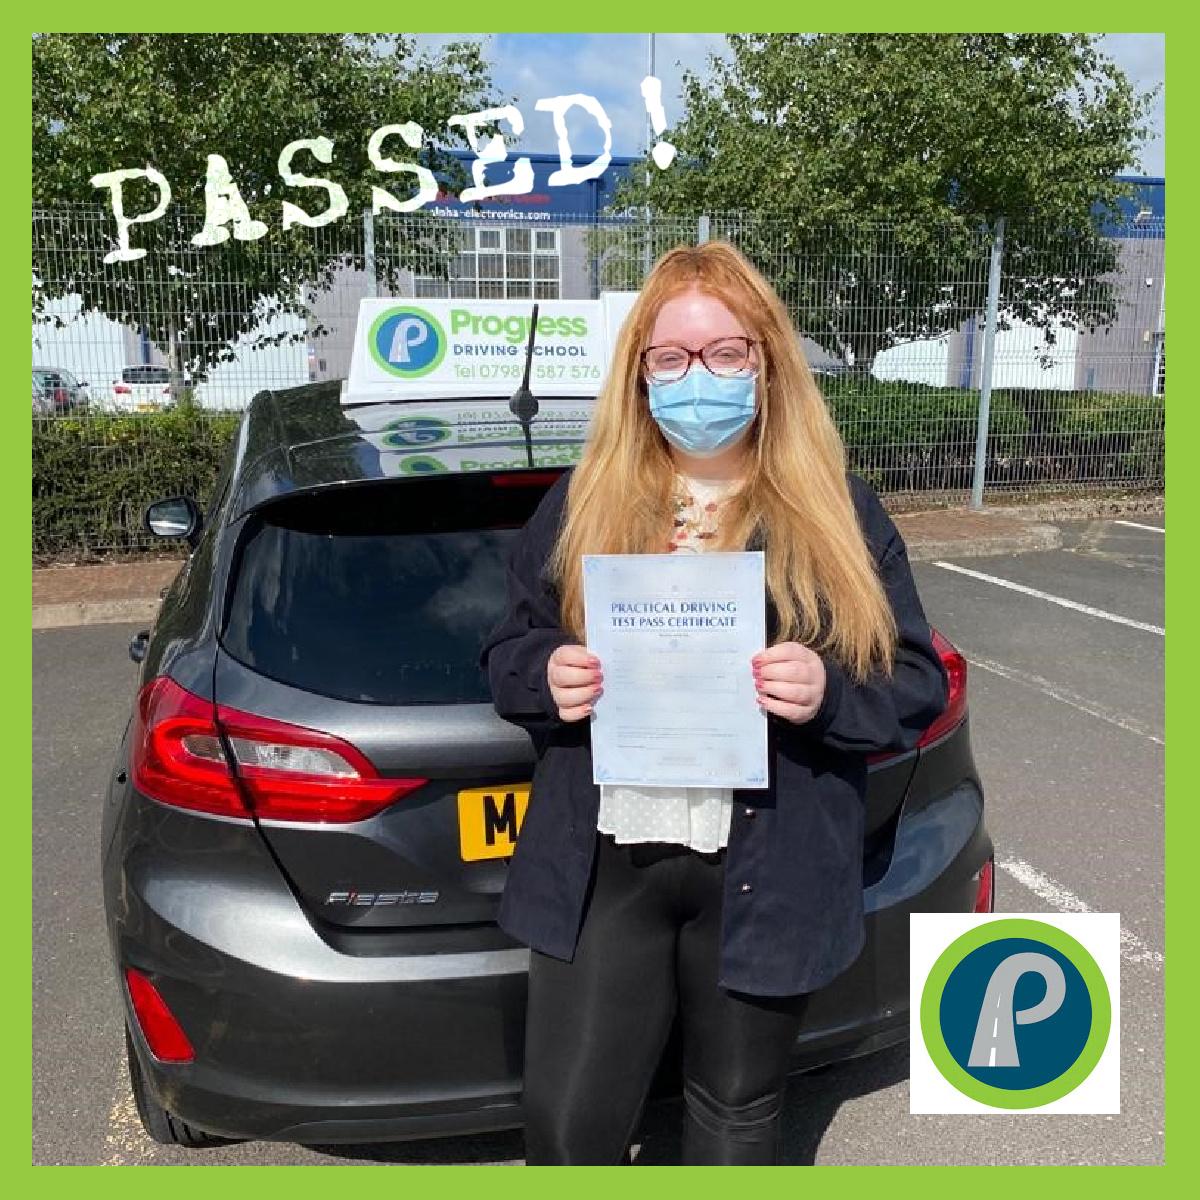 Beth passed with Progress Driving School